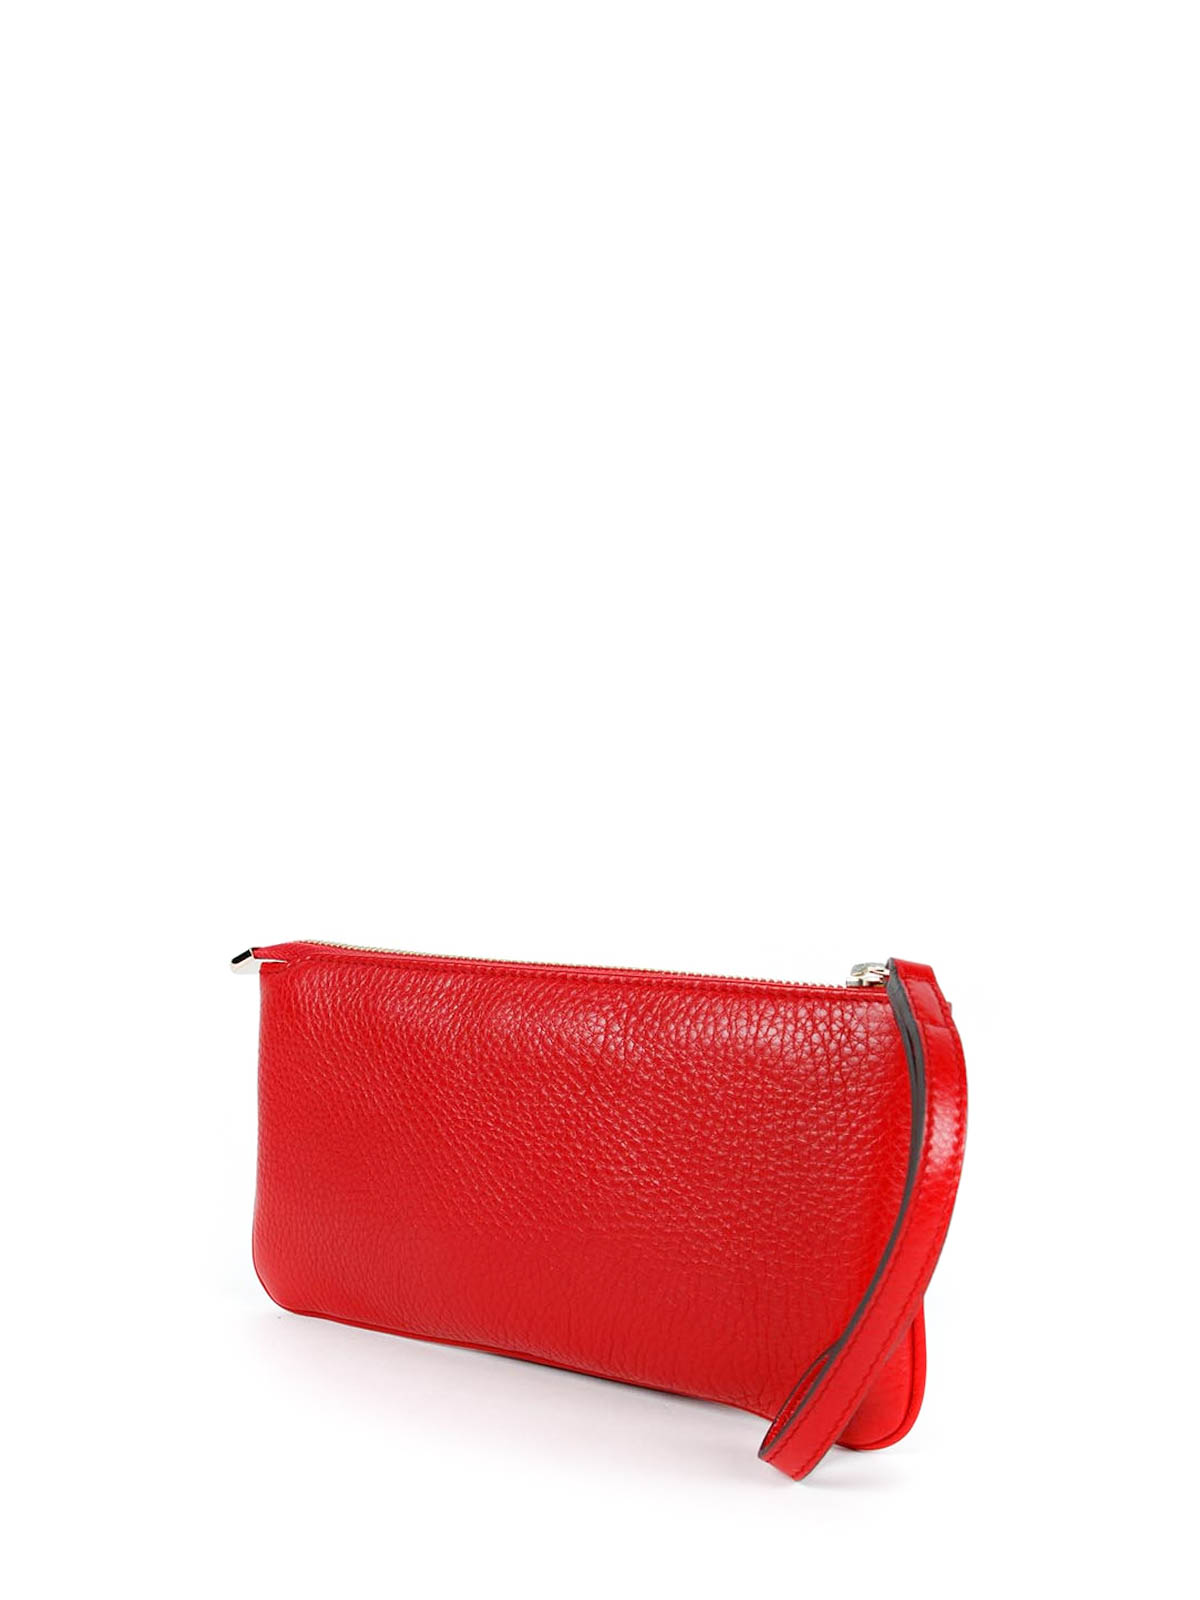 2b3948b0edc3ba Gucci - Soho wrist wallet - wallets & purses - 295840 A7M0G 6523